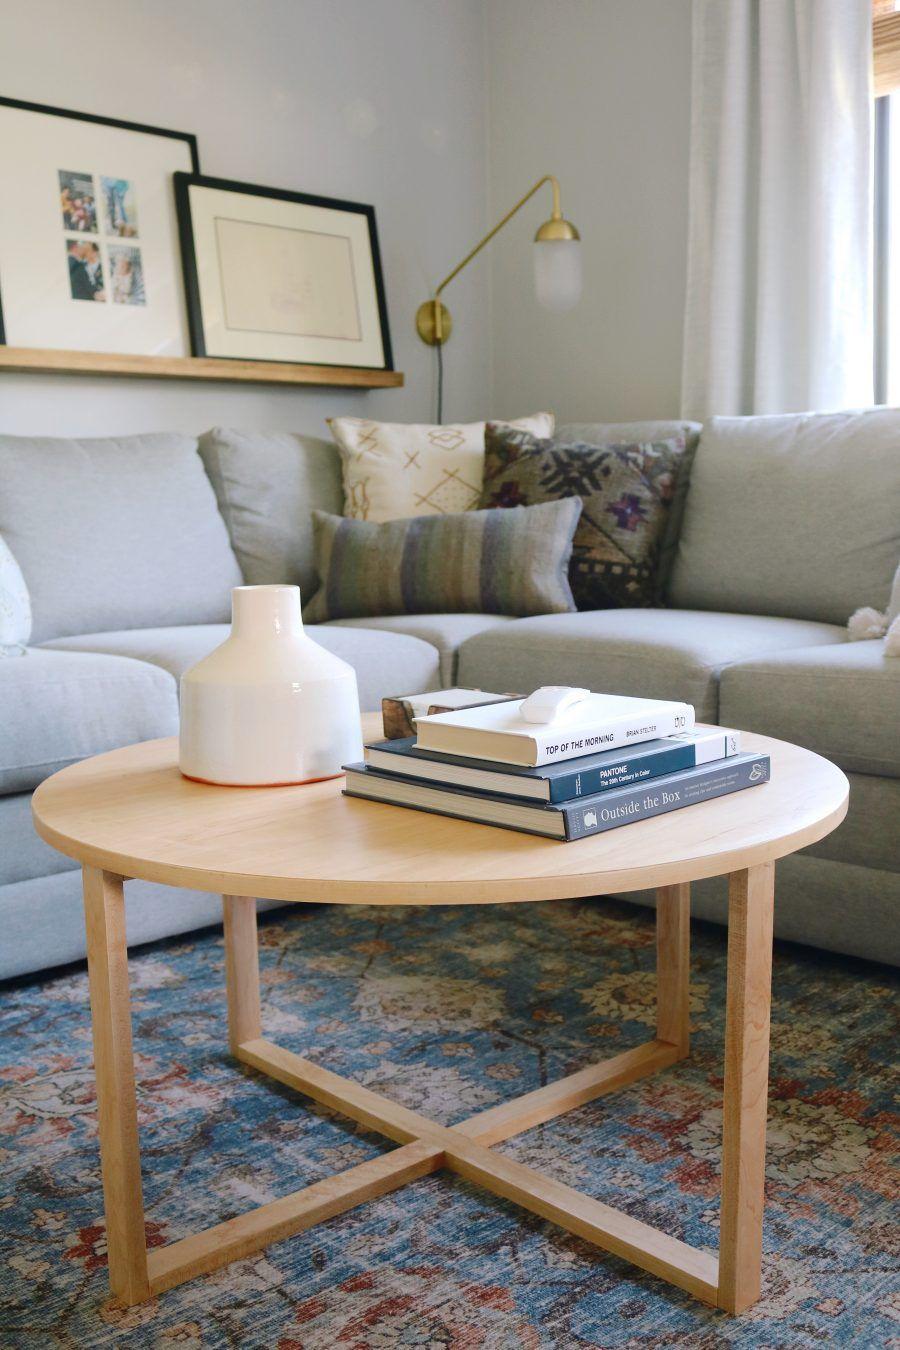 Diy Modern Round Coffee Table Coffee Table Wood Coffee Table Living Room Round Coffee Table Diy [ 1350 x 900 Pixel ]